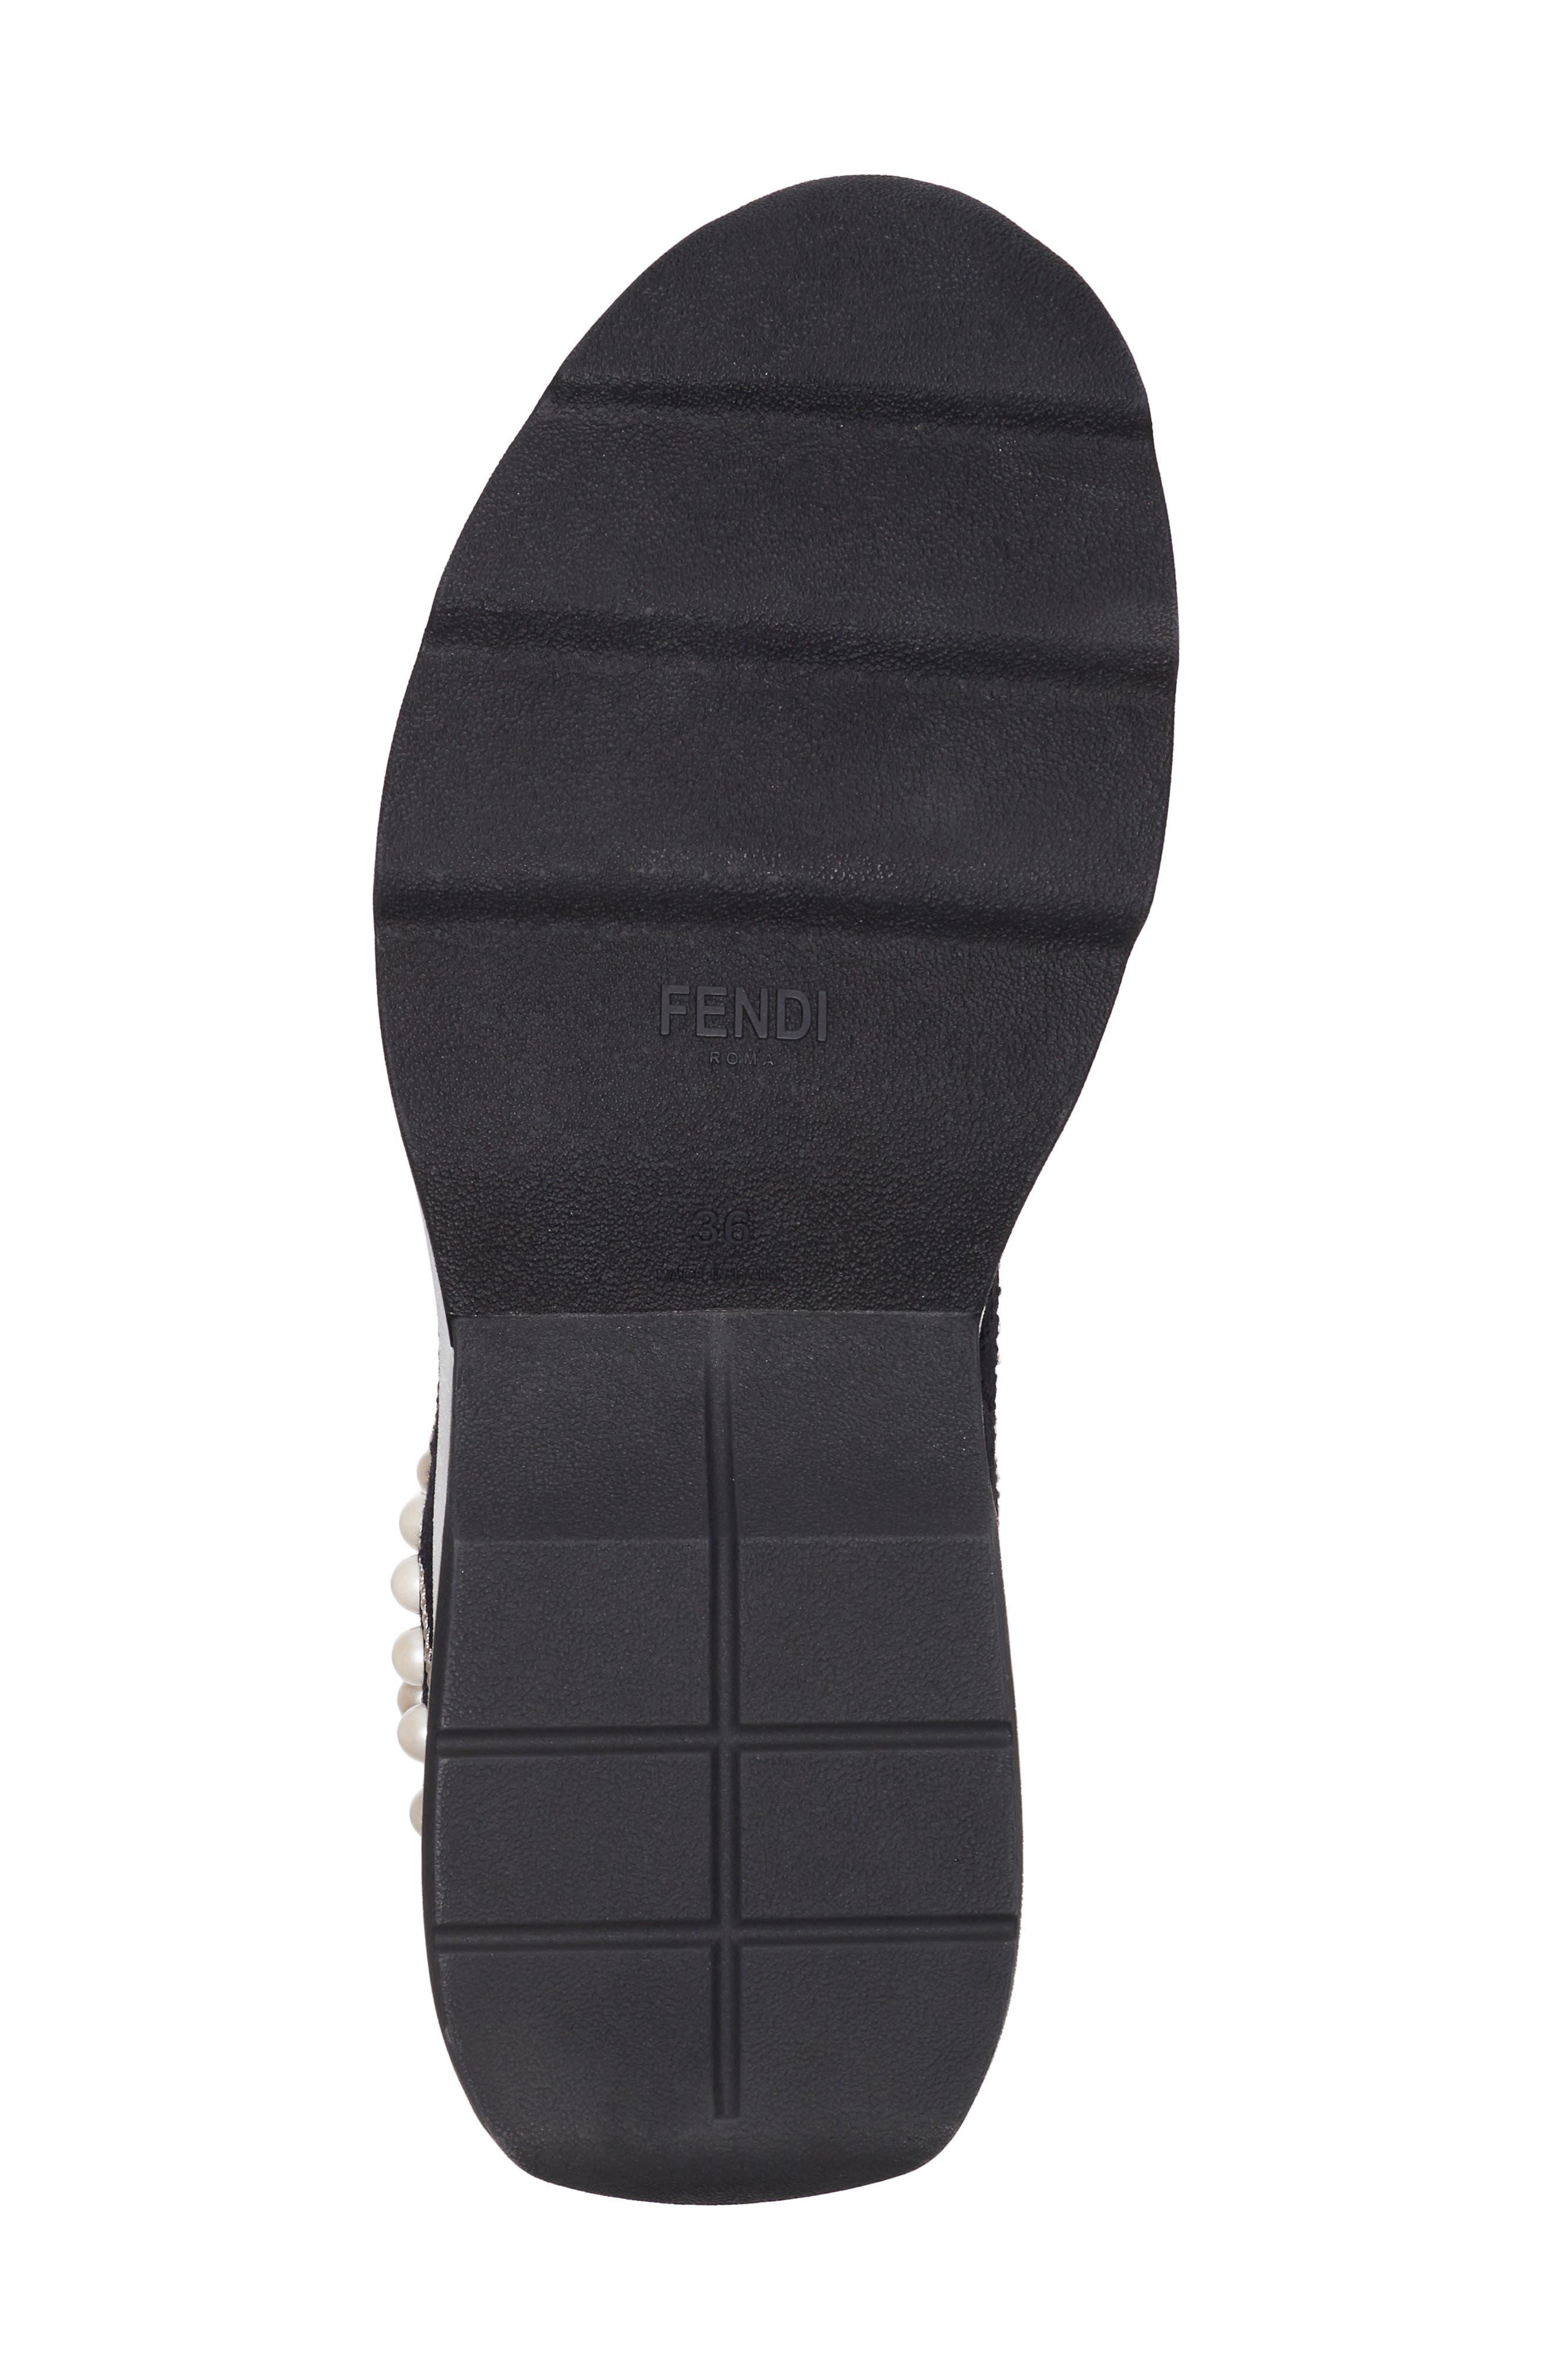 Rockoko Pearland Embellished Sock Sneaker,                             Alternate thumbnail 6, color,                             Black